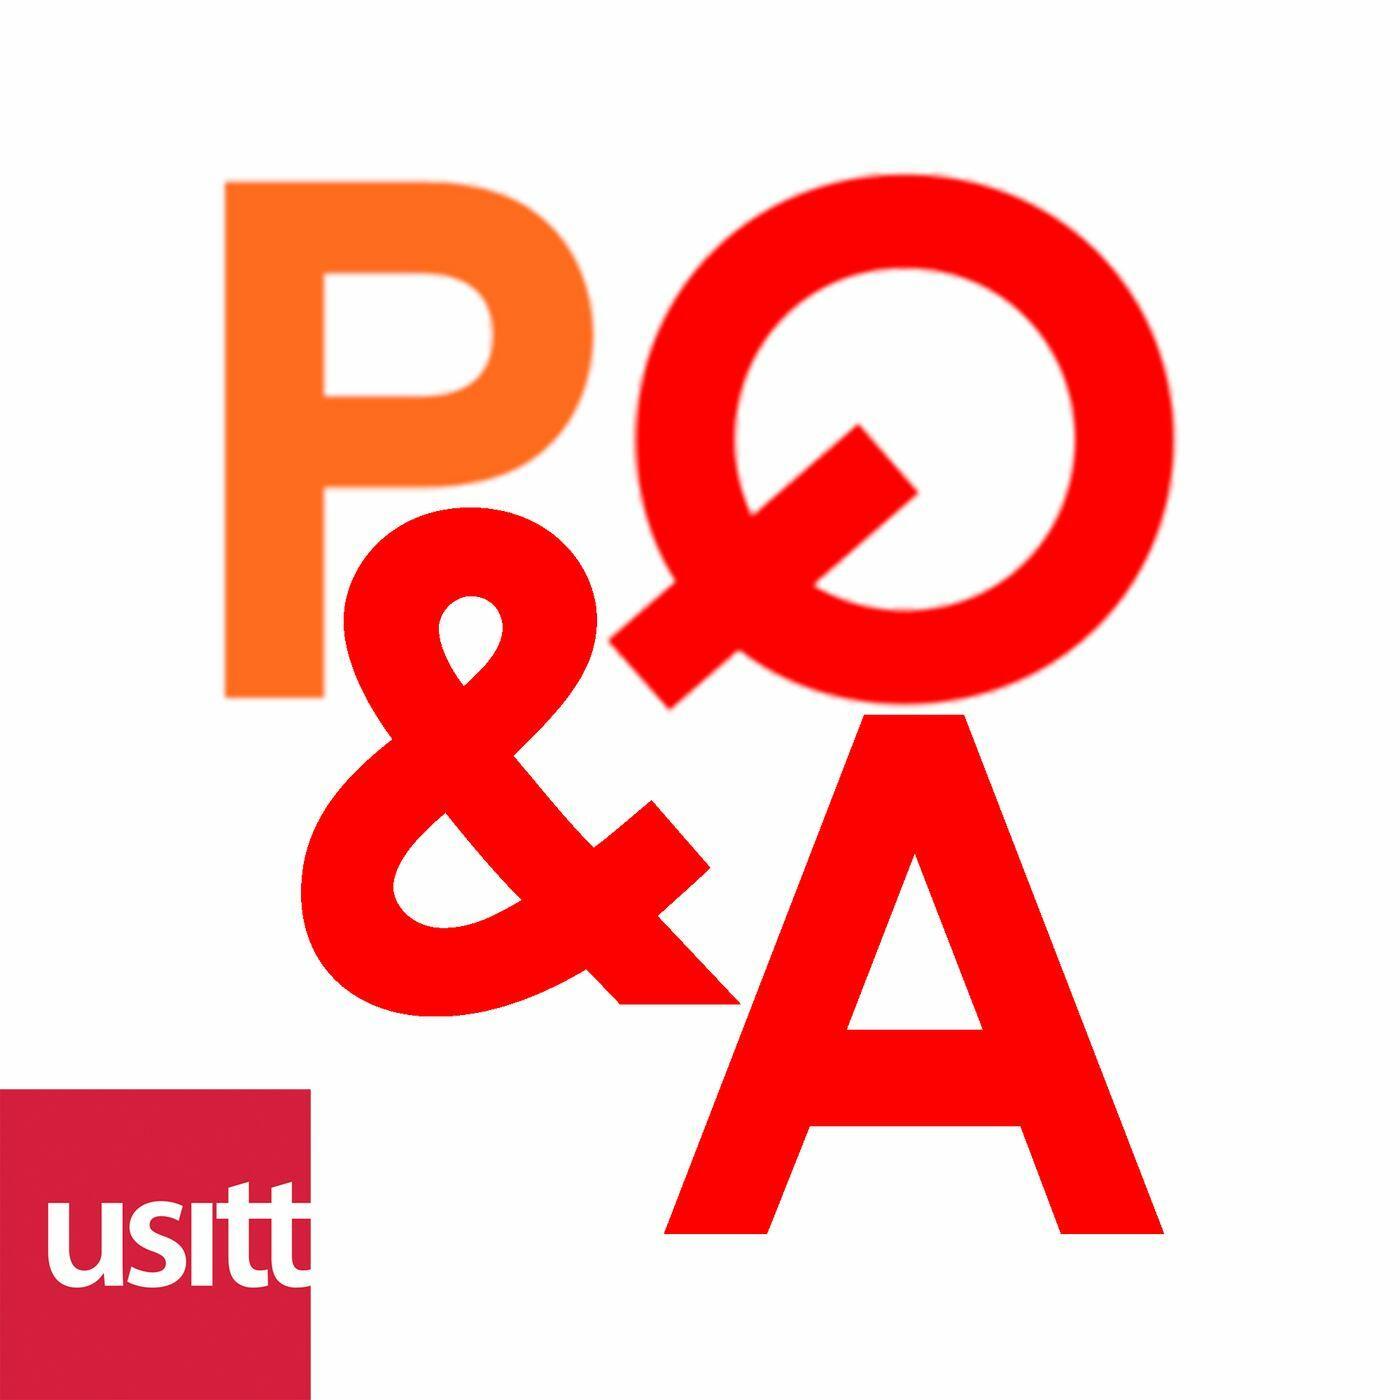 PQ&A - USITT at the 2019 PQ